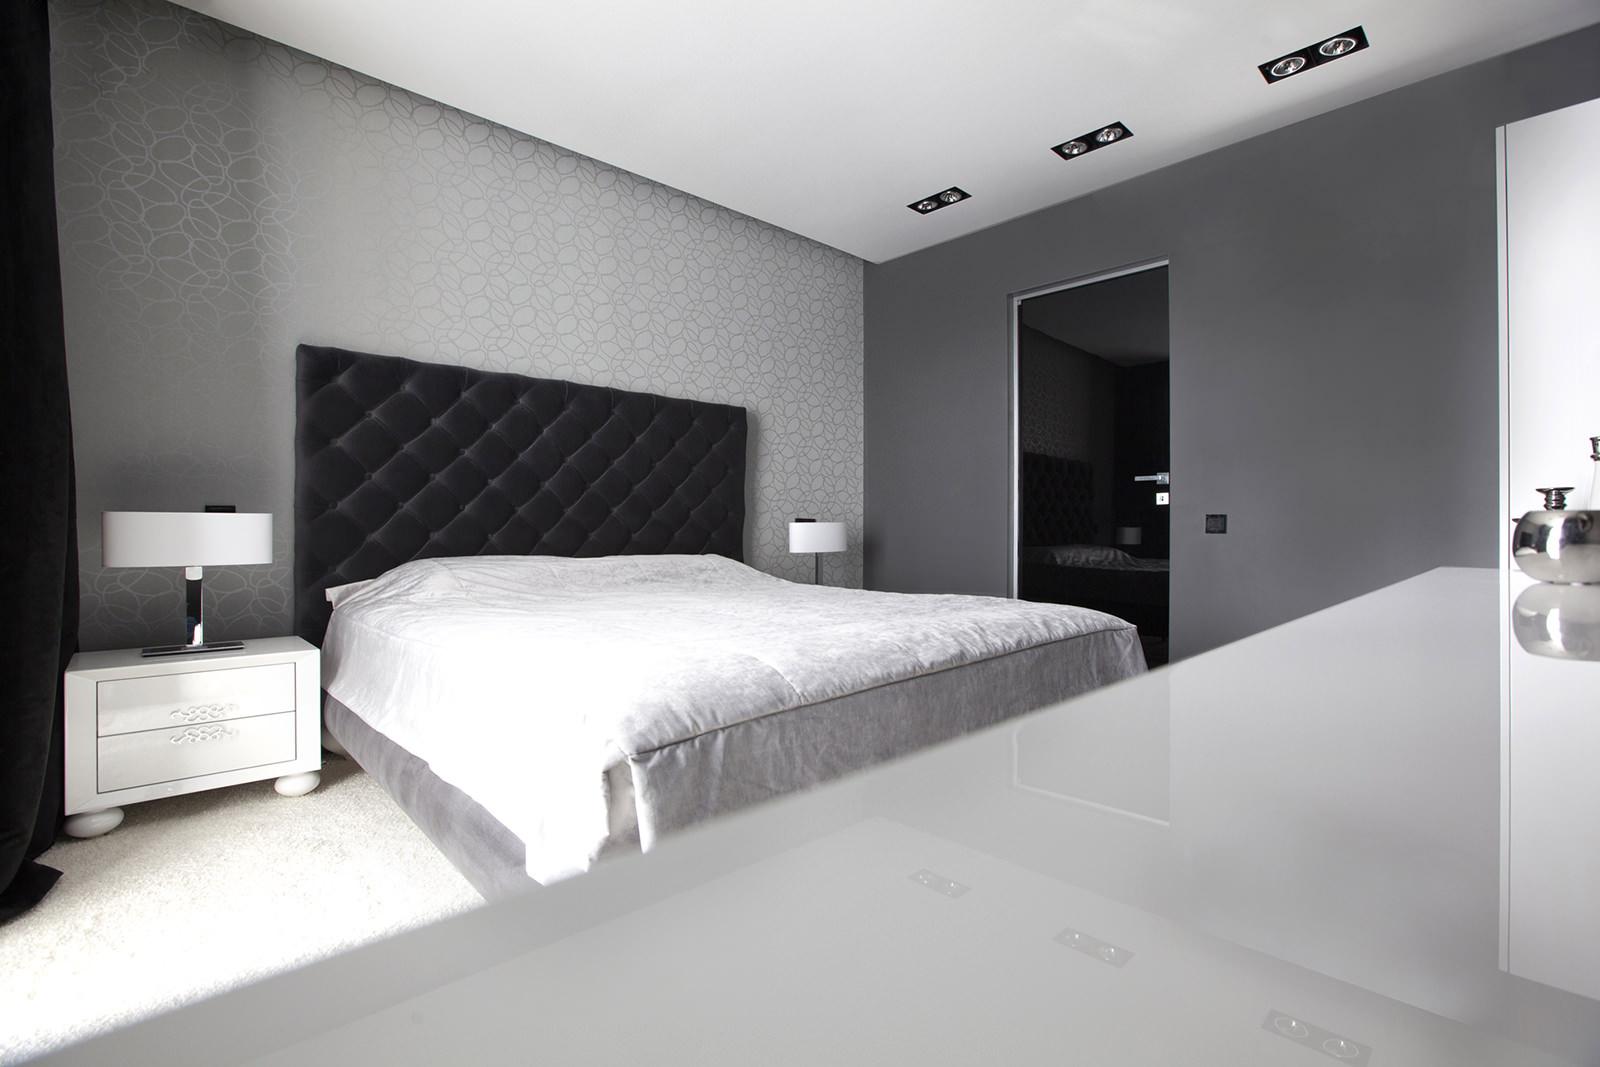 Черно-белая спальня с минимумом декора